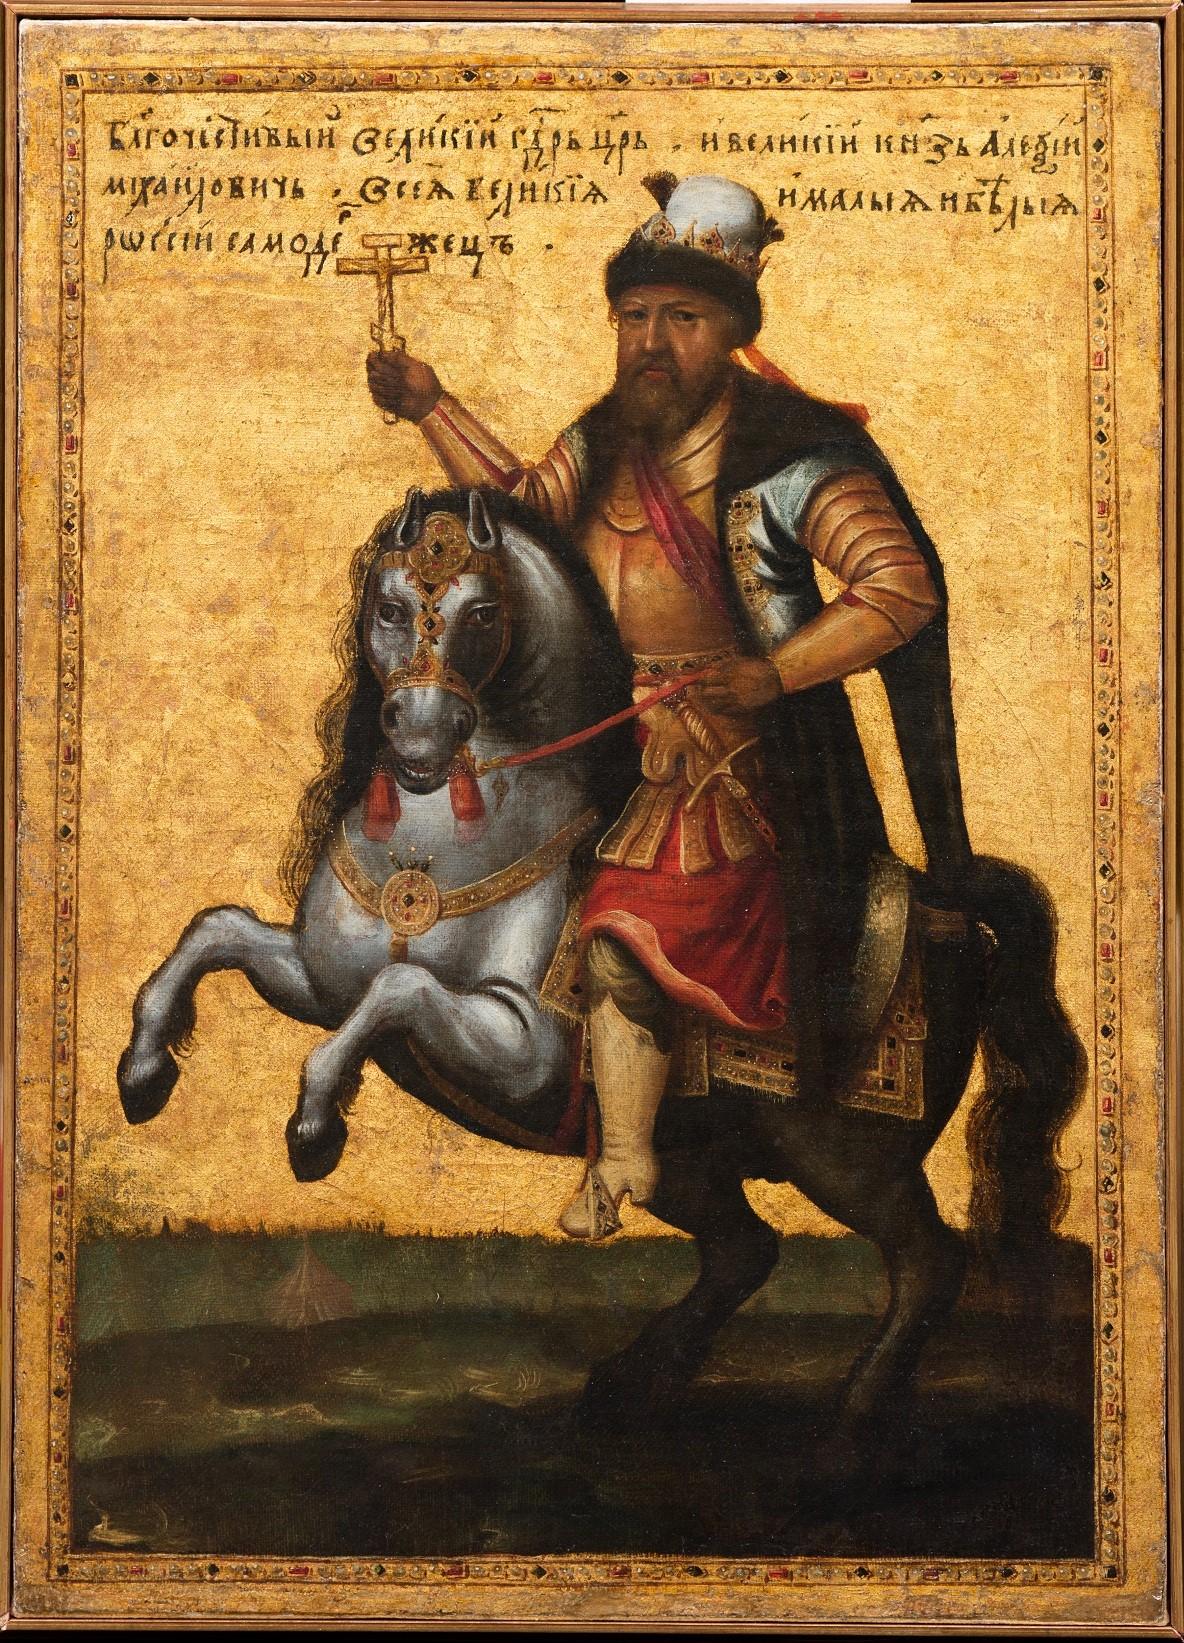 Equestrian portrait of Alexis of Russia (17 c, GIM).jpg